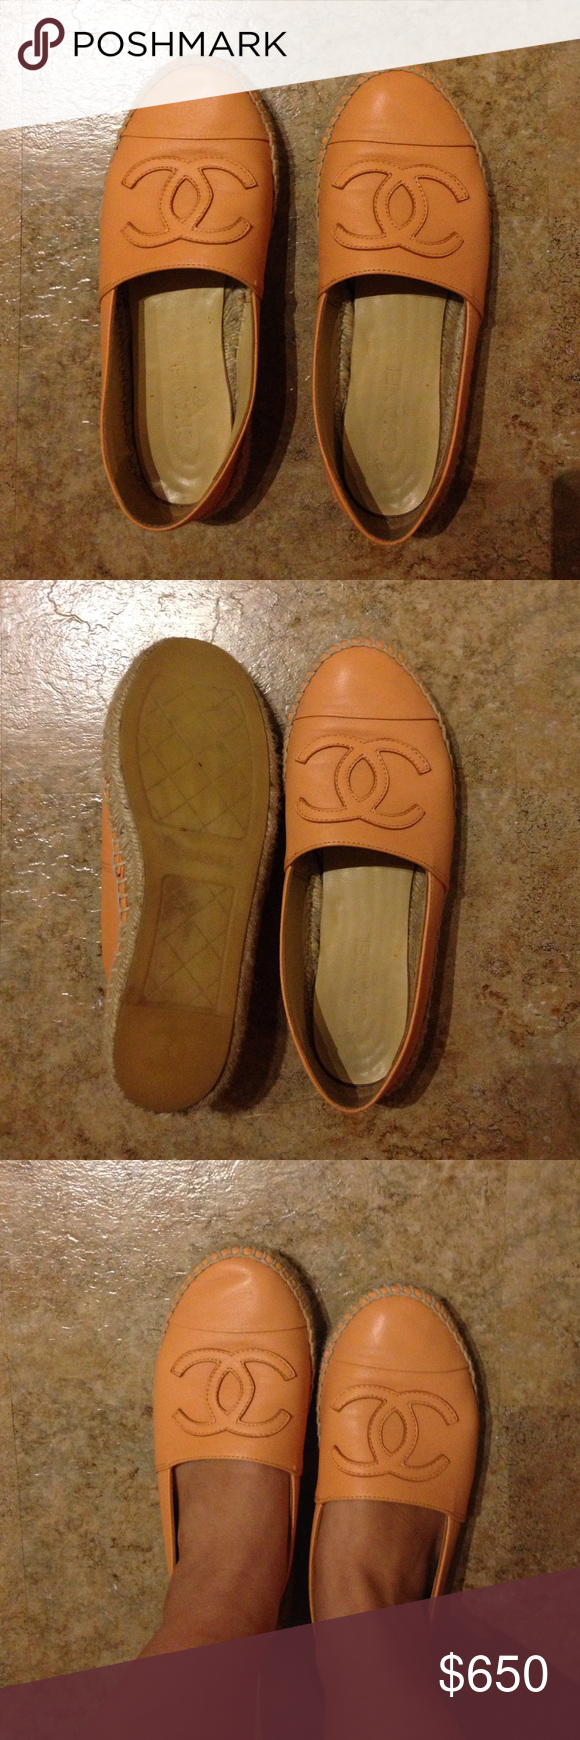 Chanel light orange espadrilles lambskin leather A little worn, super comfortable espadrilles. CHANEL Shoes Espadrilles